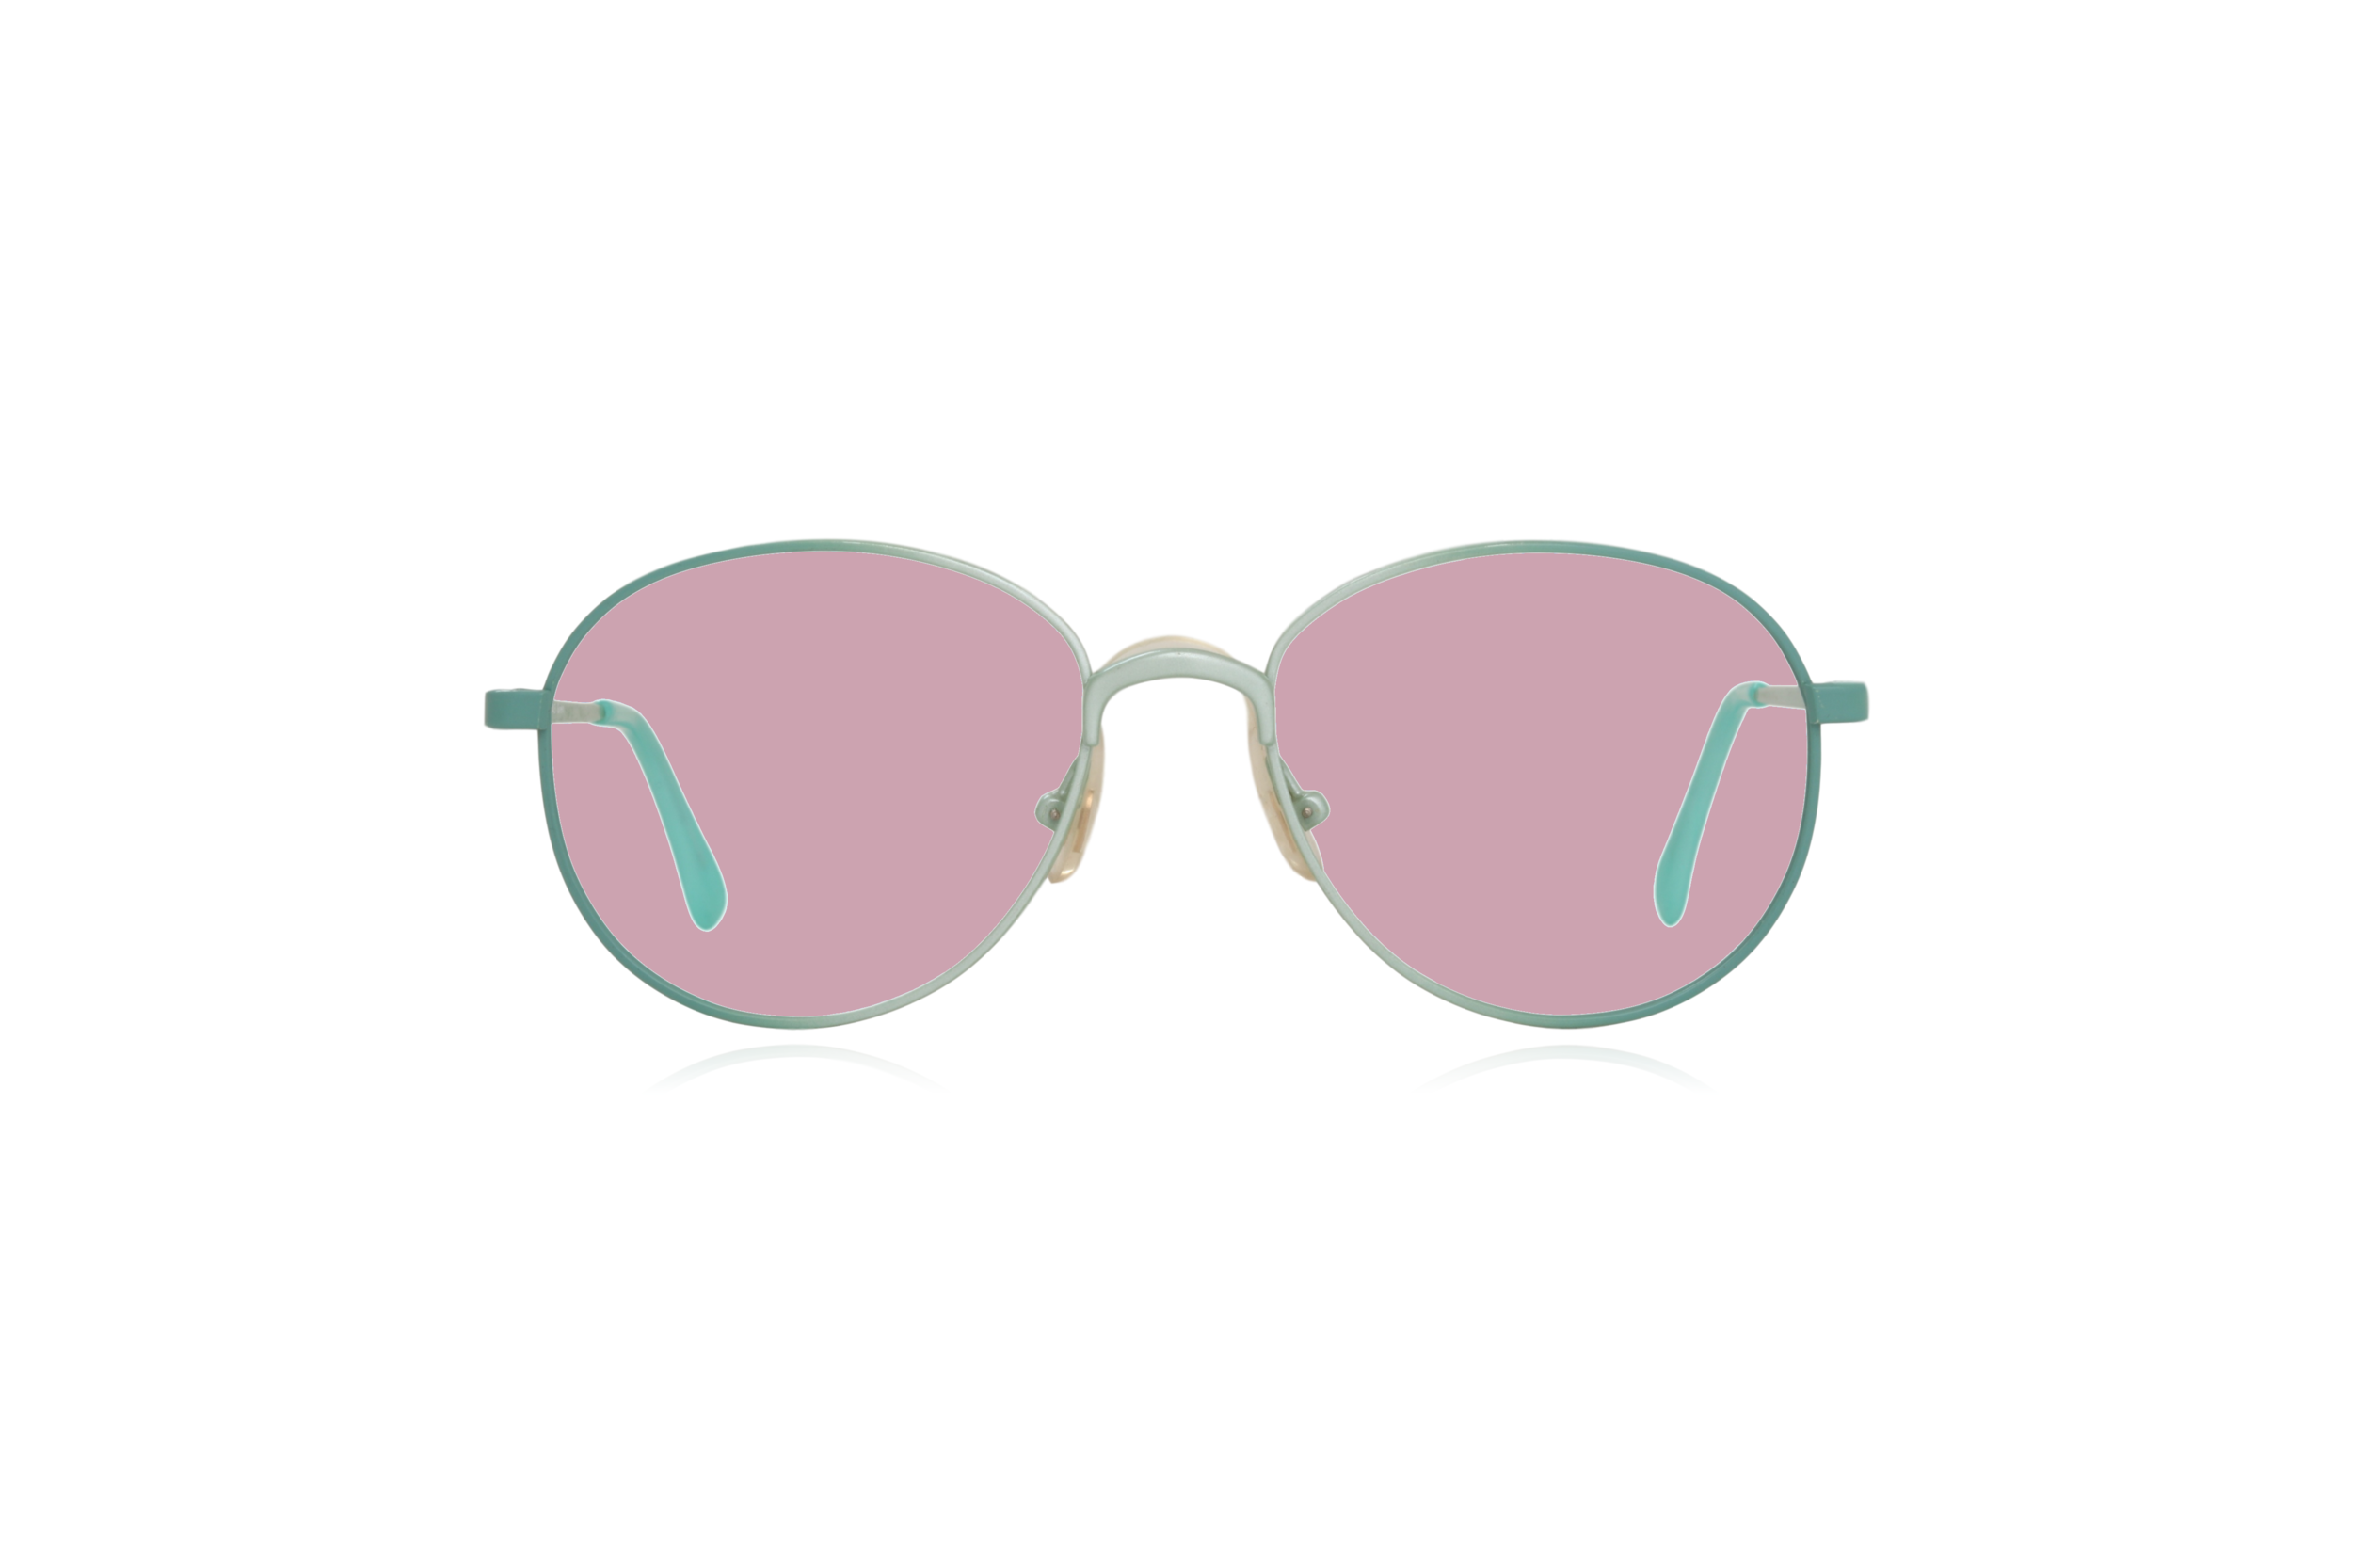 Peep Eyewear, Vintage Glasses, Round, Mint Green, Candy, Pink.png